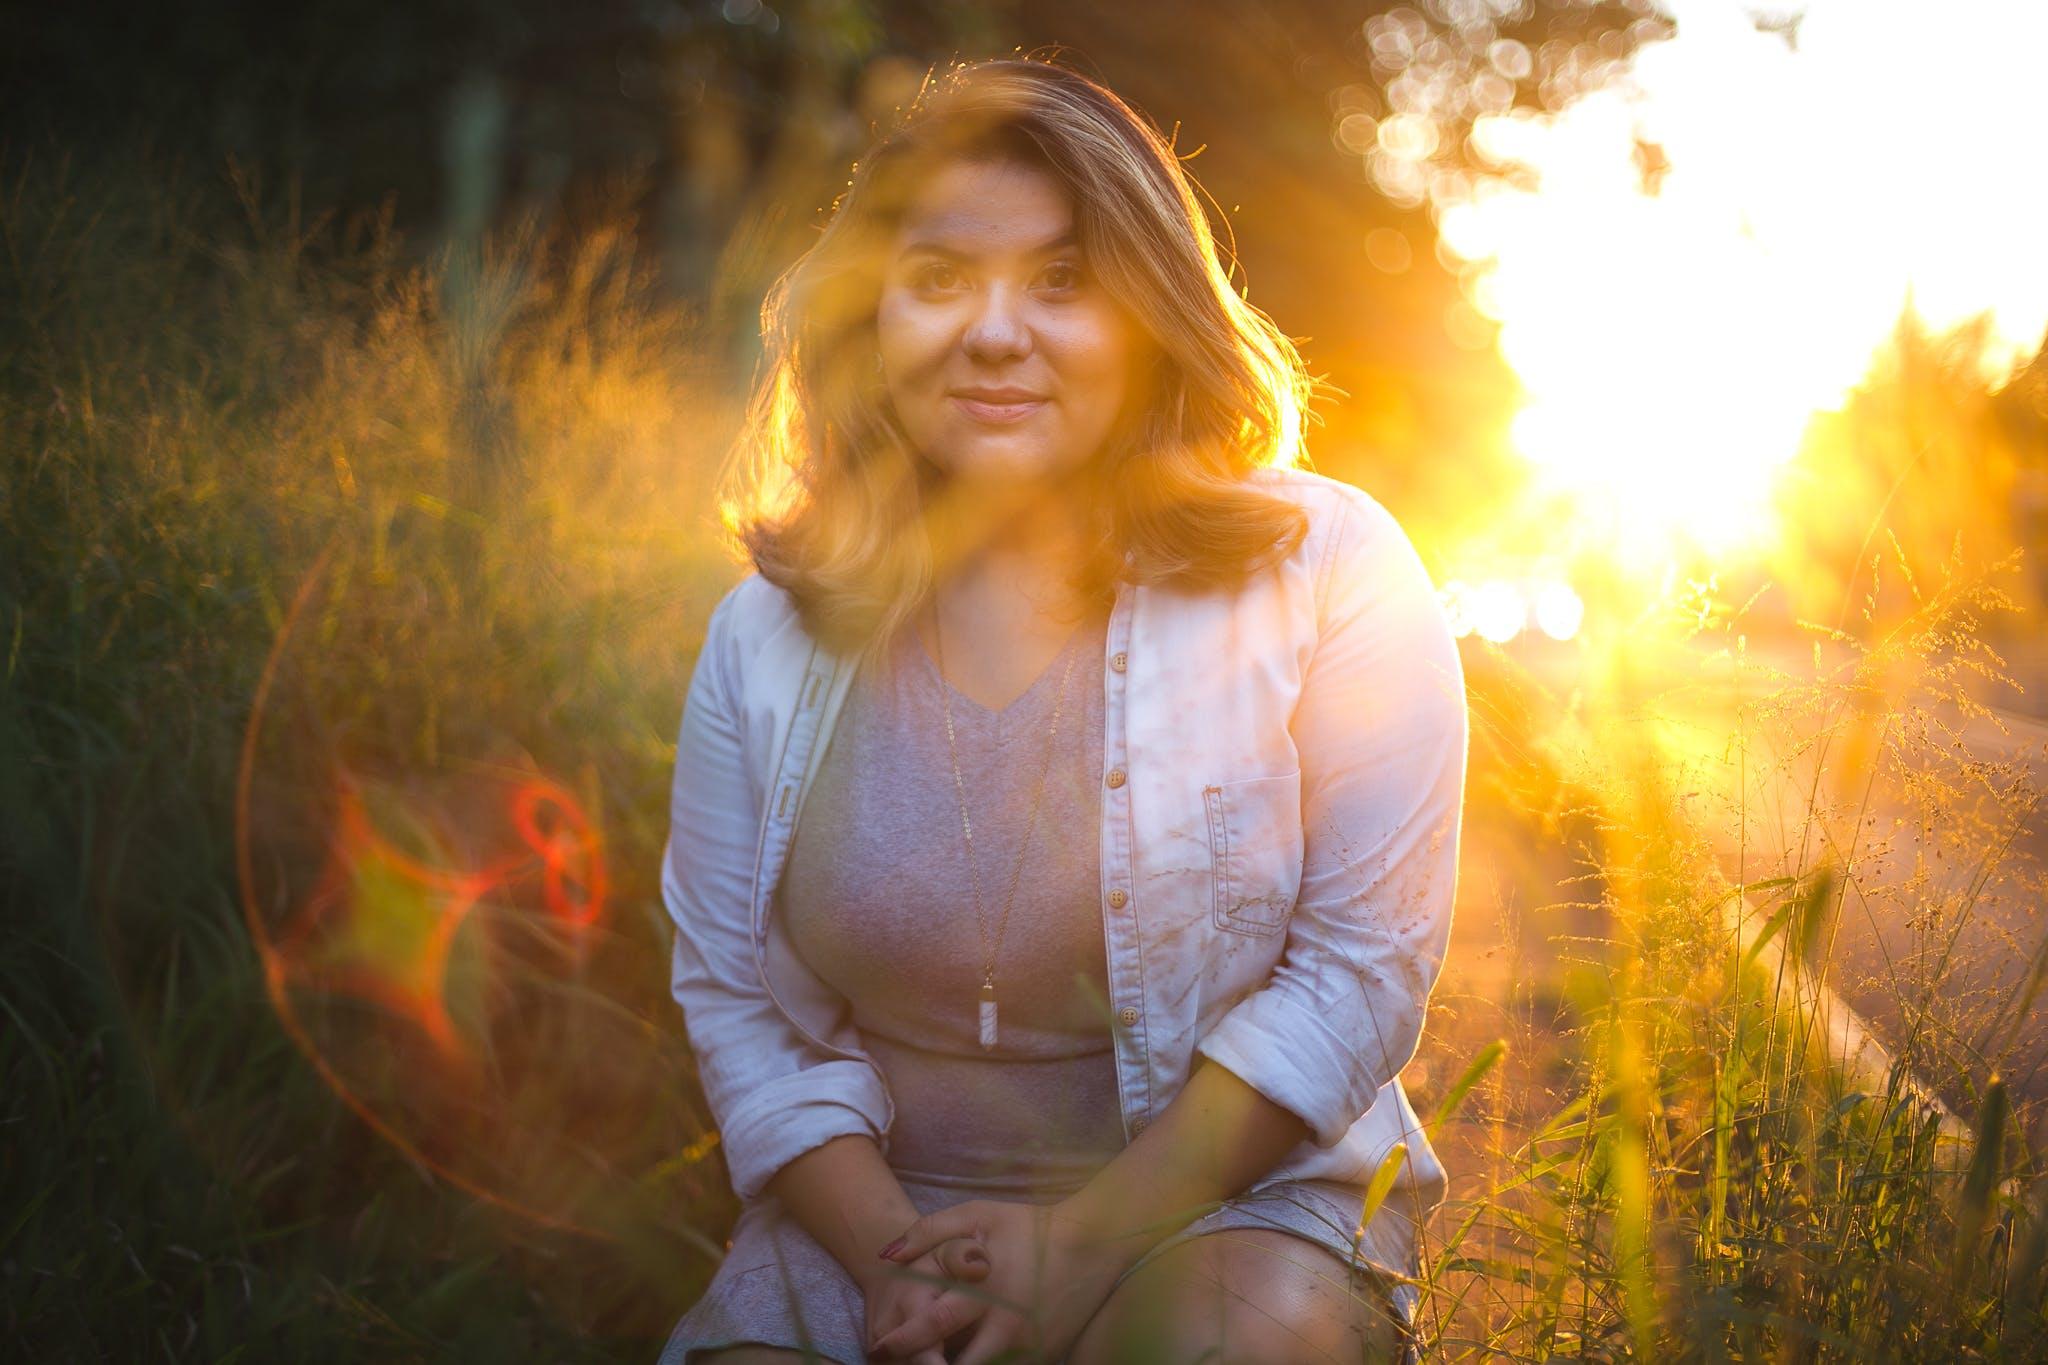 Free stock photo of brazilian woman, female, girl, golden sunset